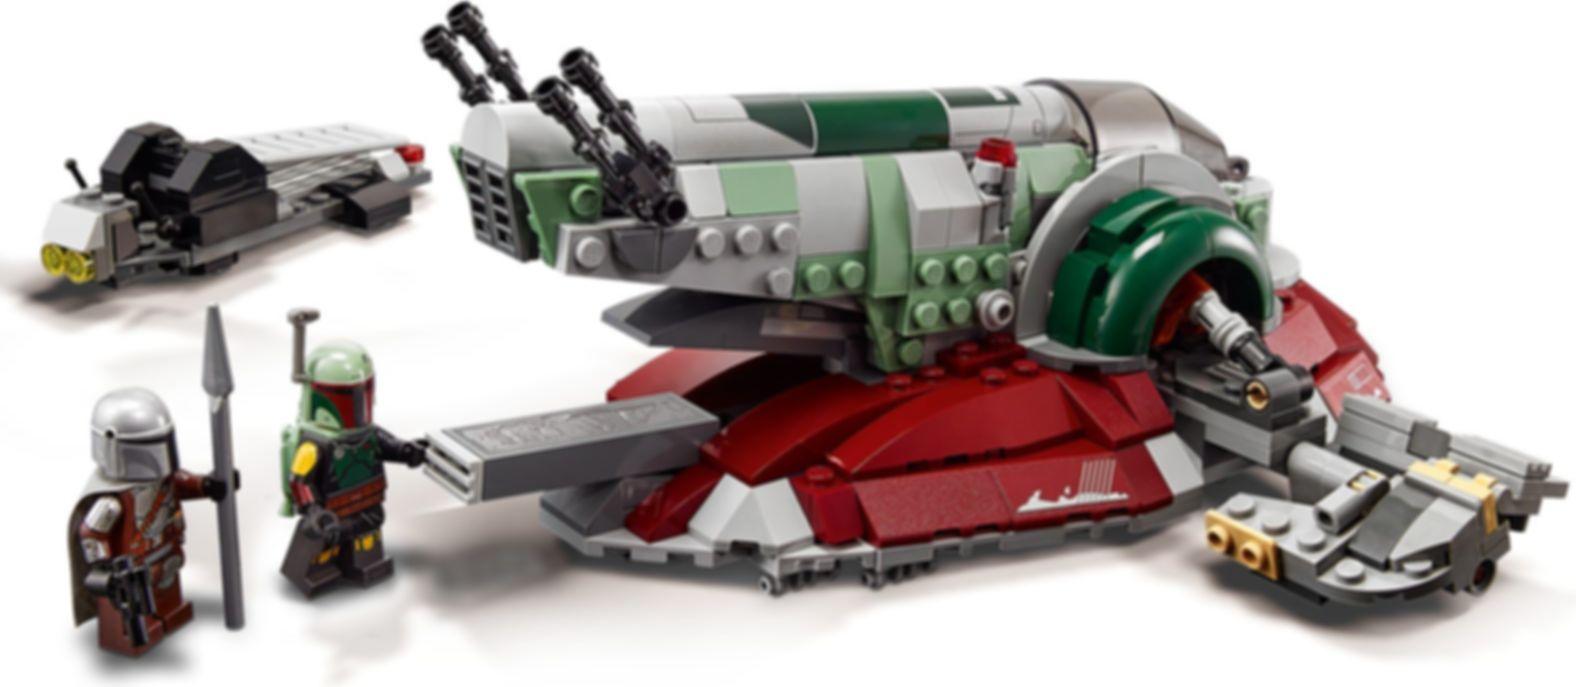 Boba Fetts Starship™ gameplay